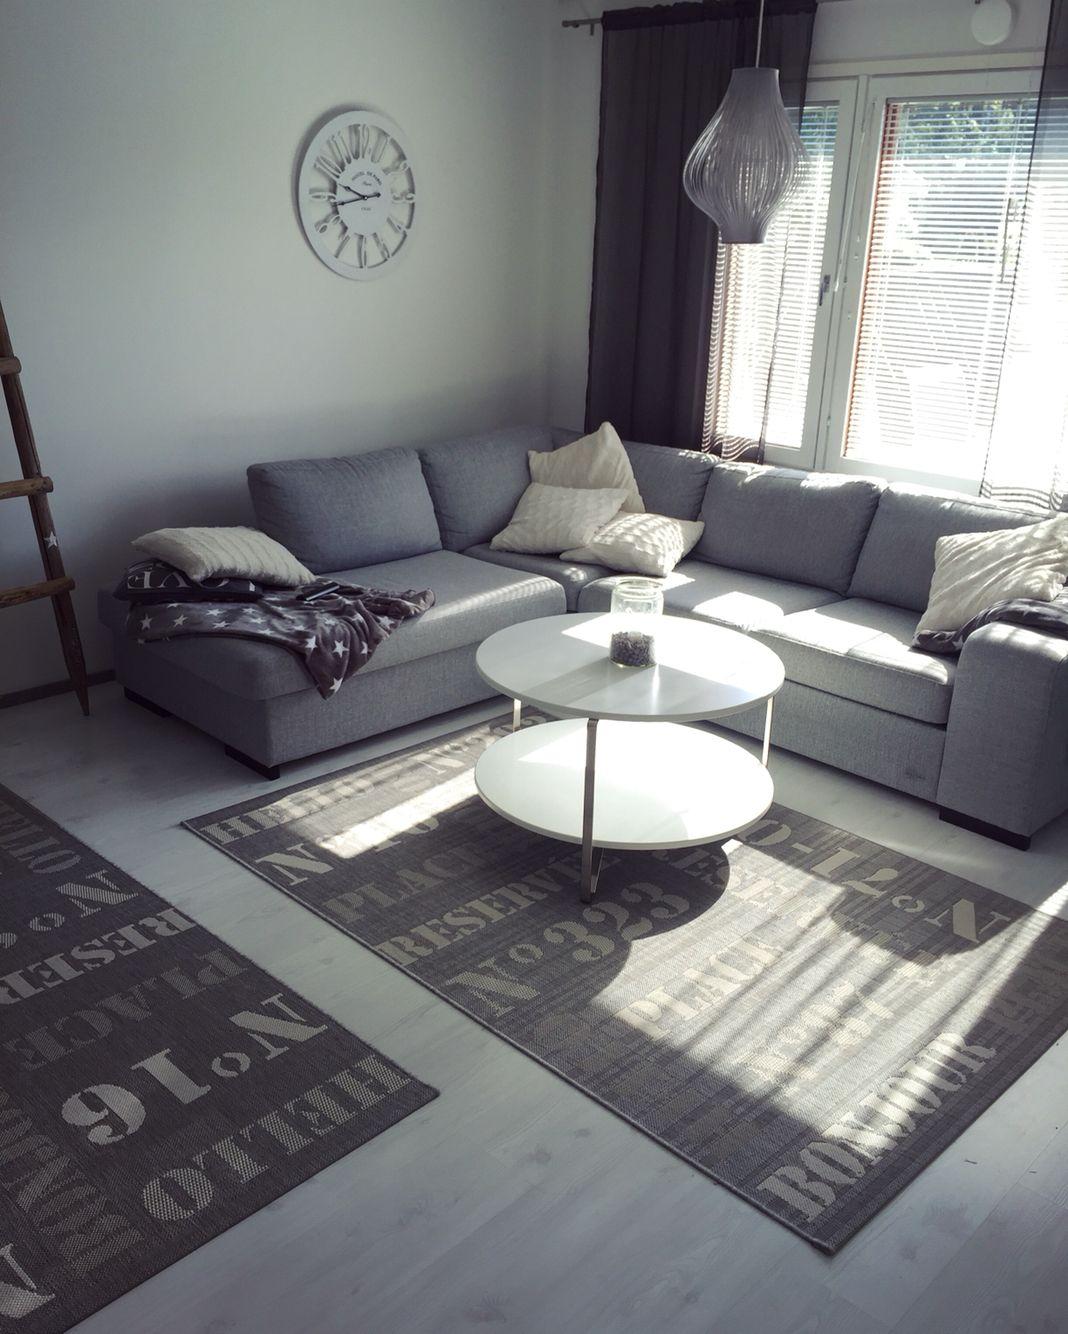 Ikea imfors white my day pinterest ikea imfors white geotapseo Image collections